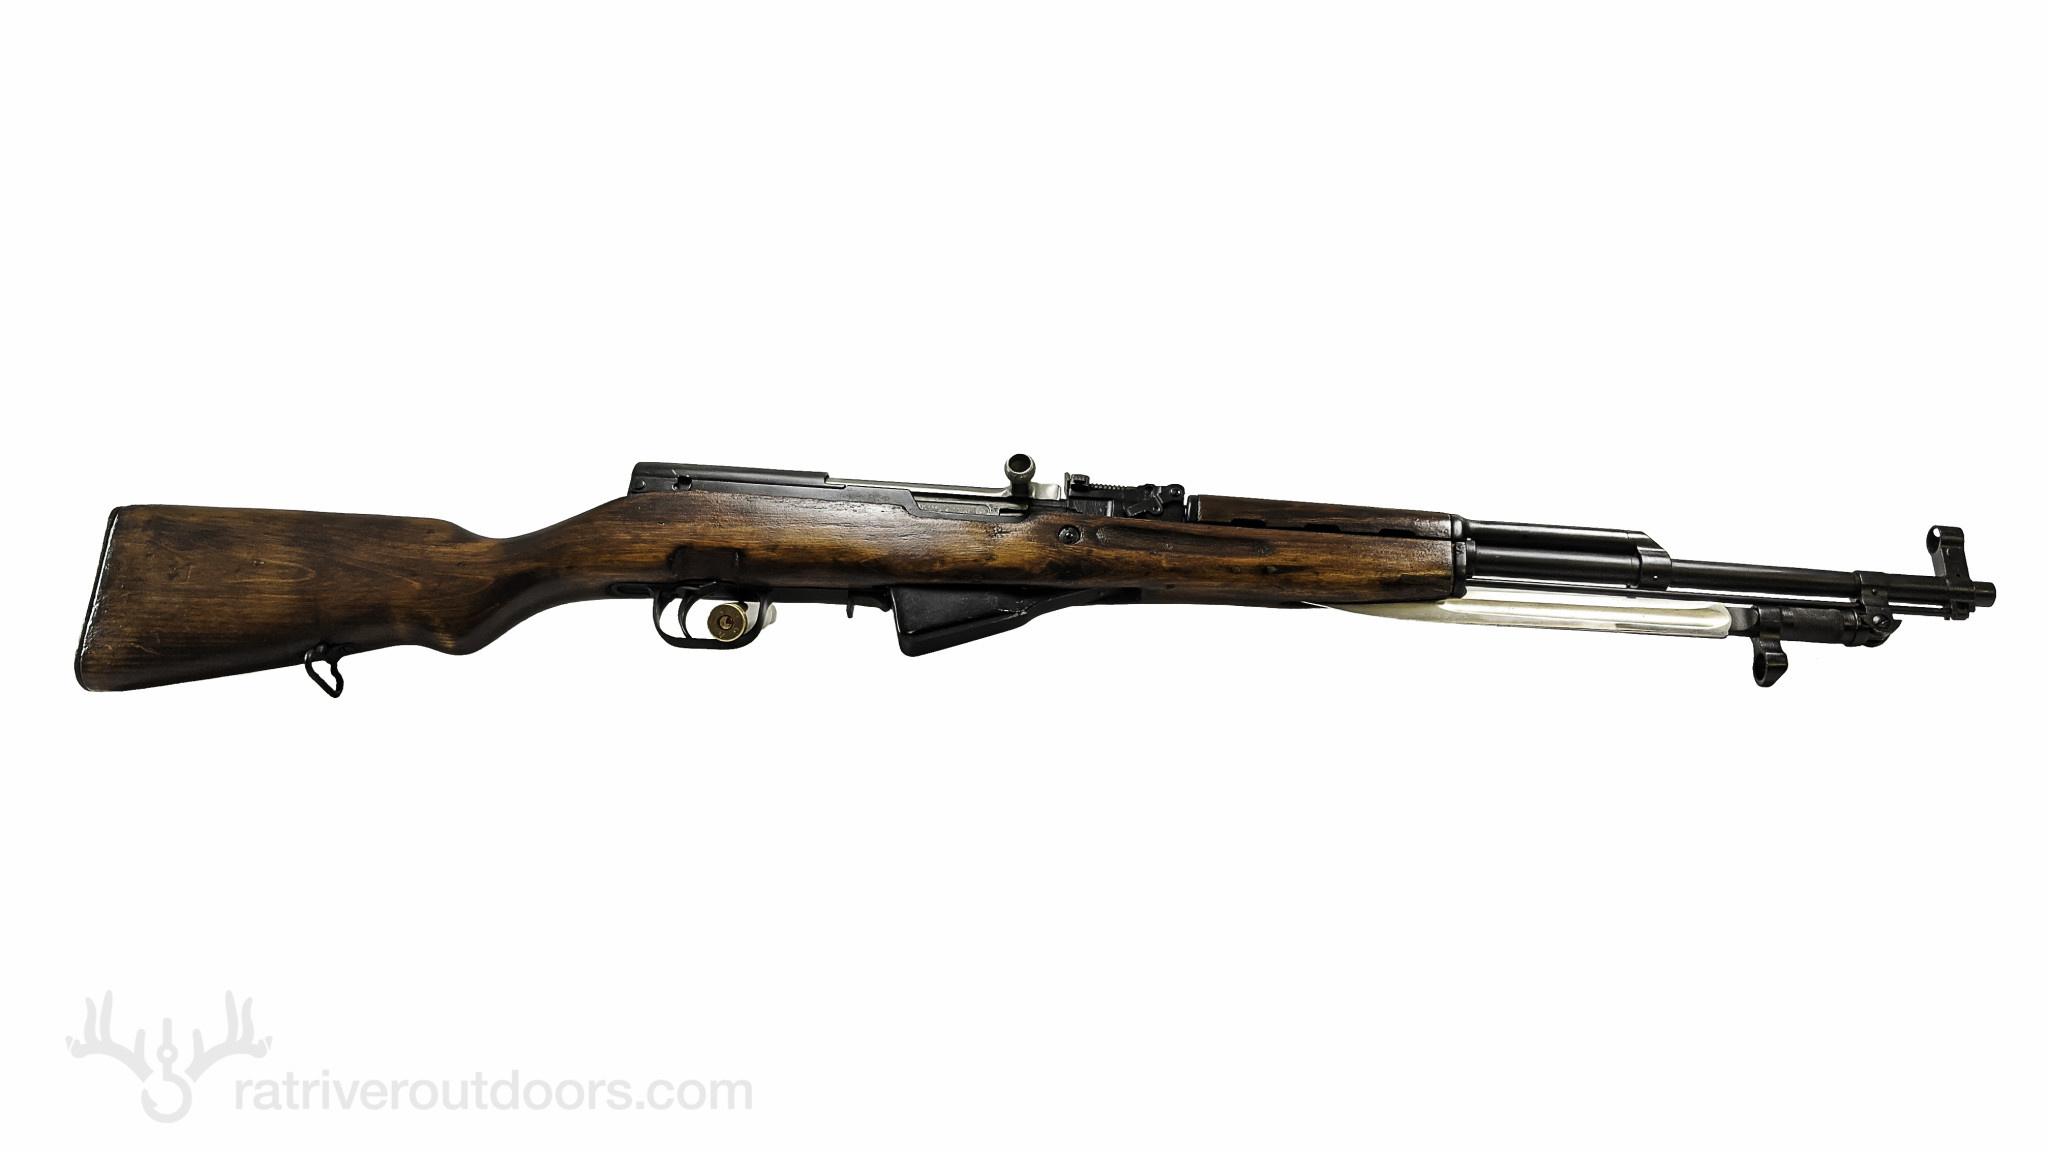 Russian Sks 7.62x39 (Wood Stock)